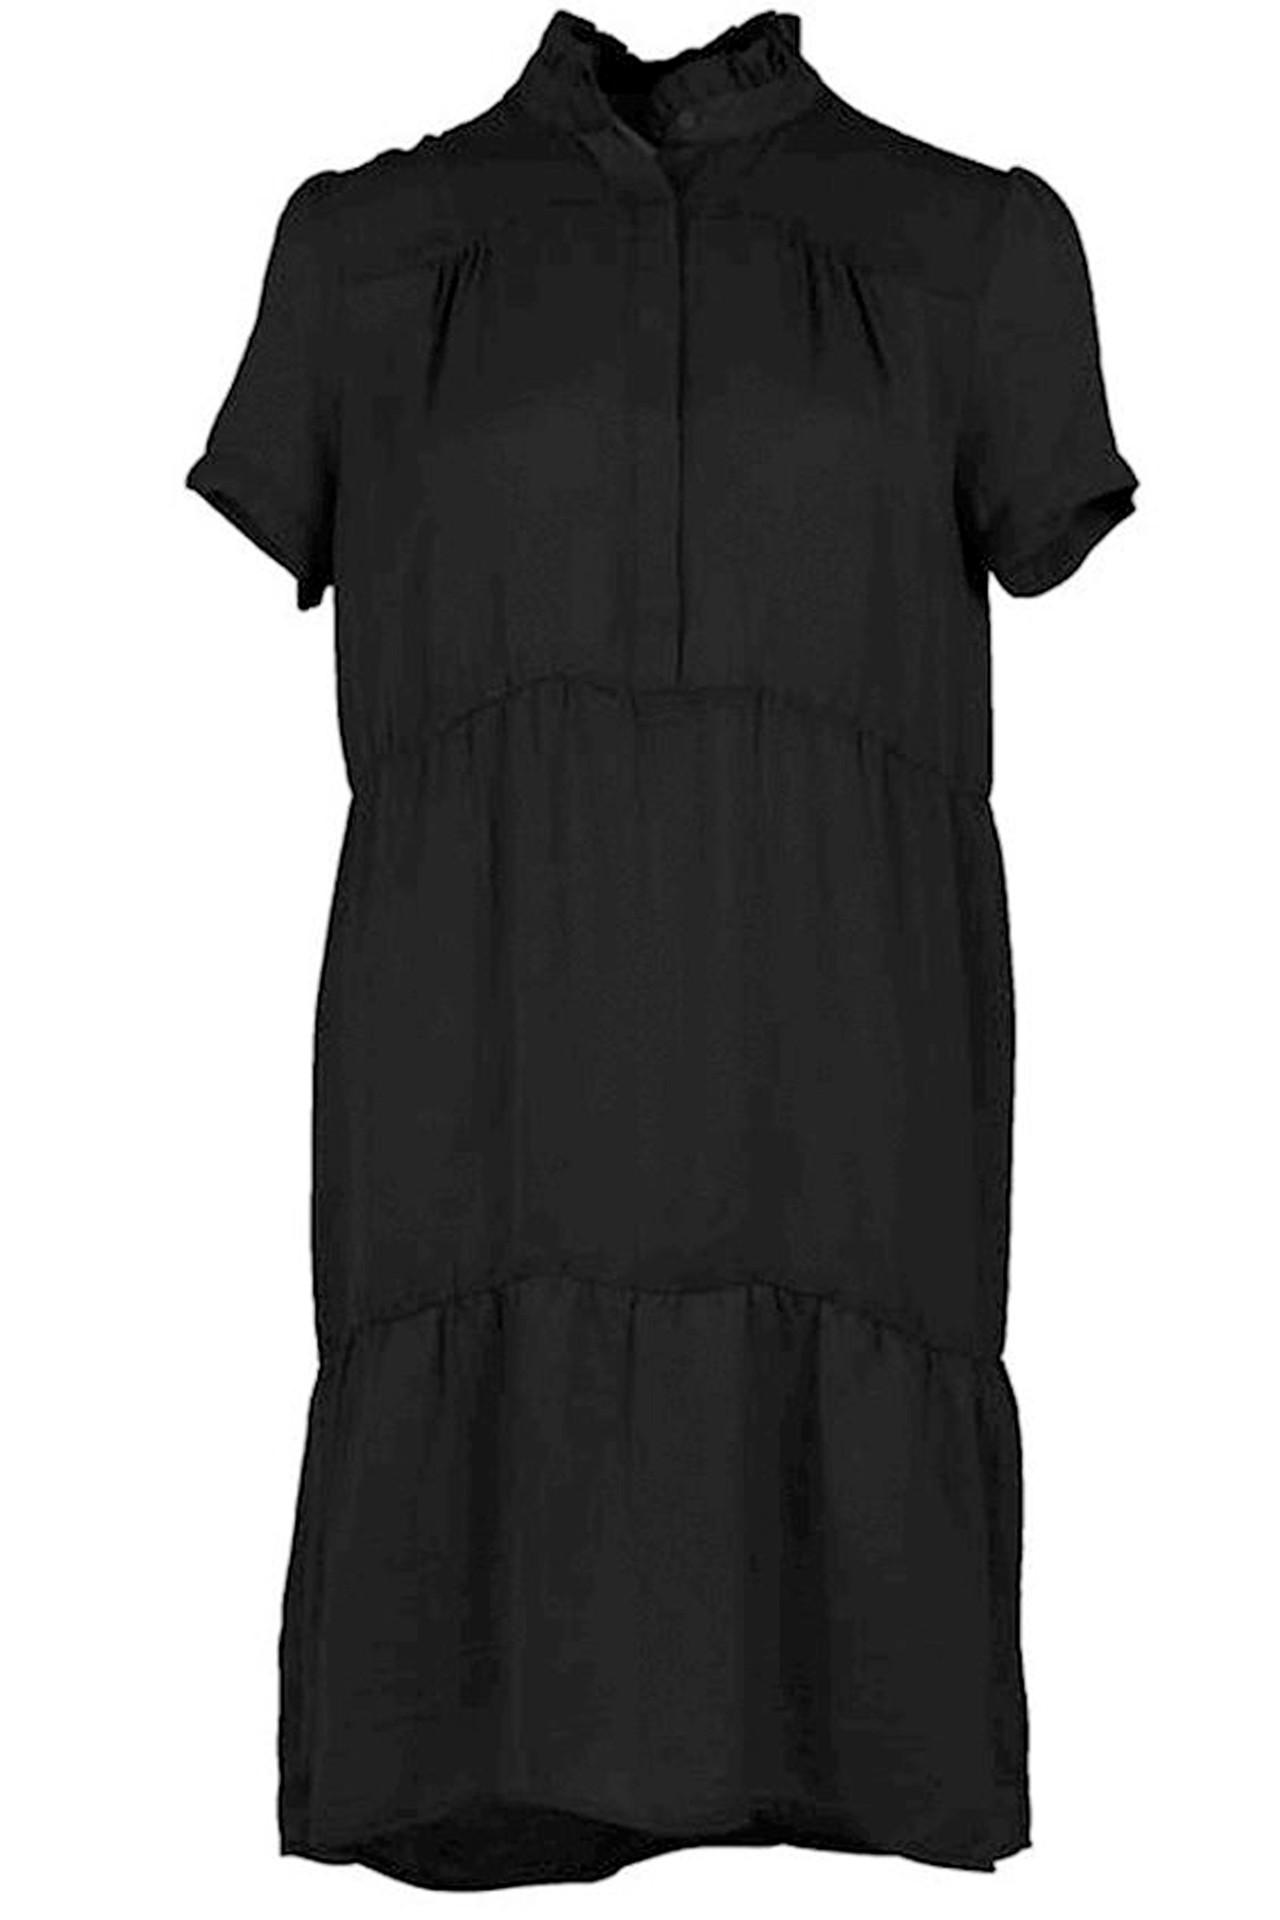 neo noir kjole sort